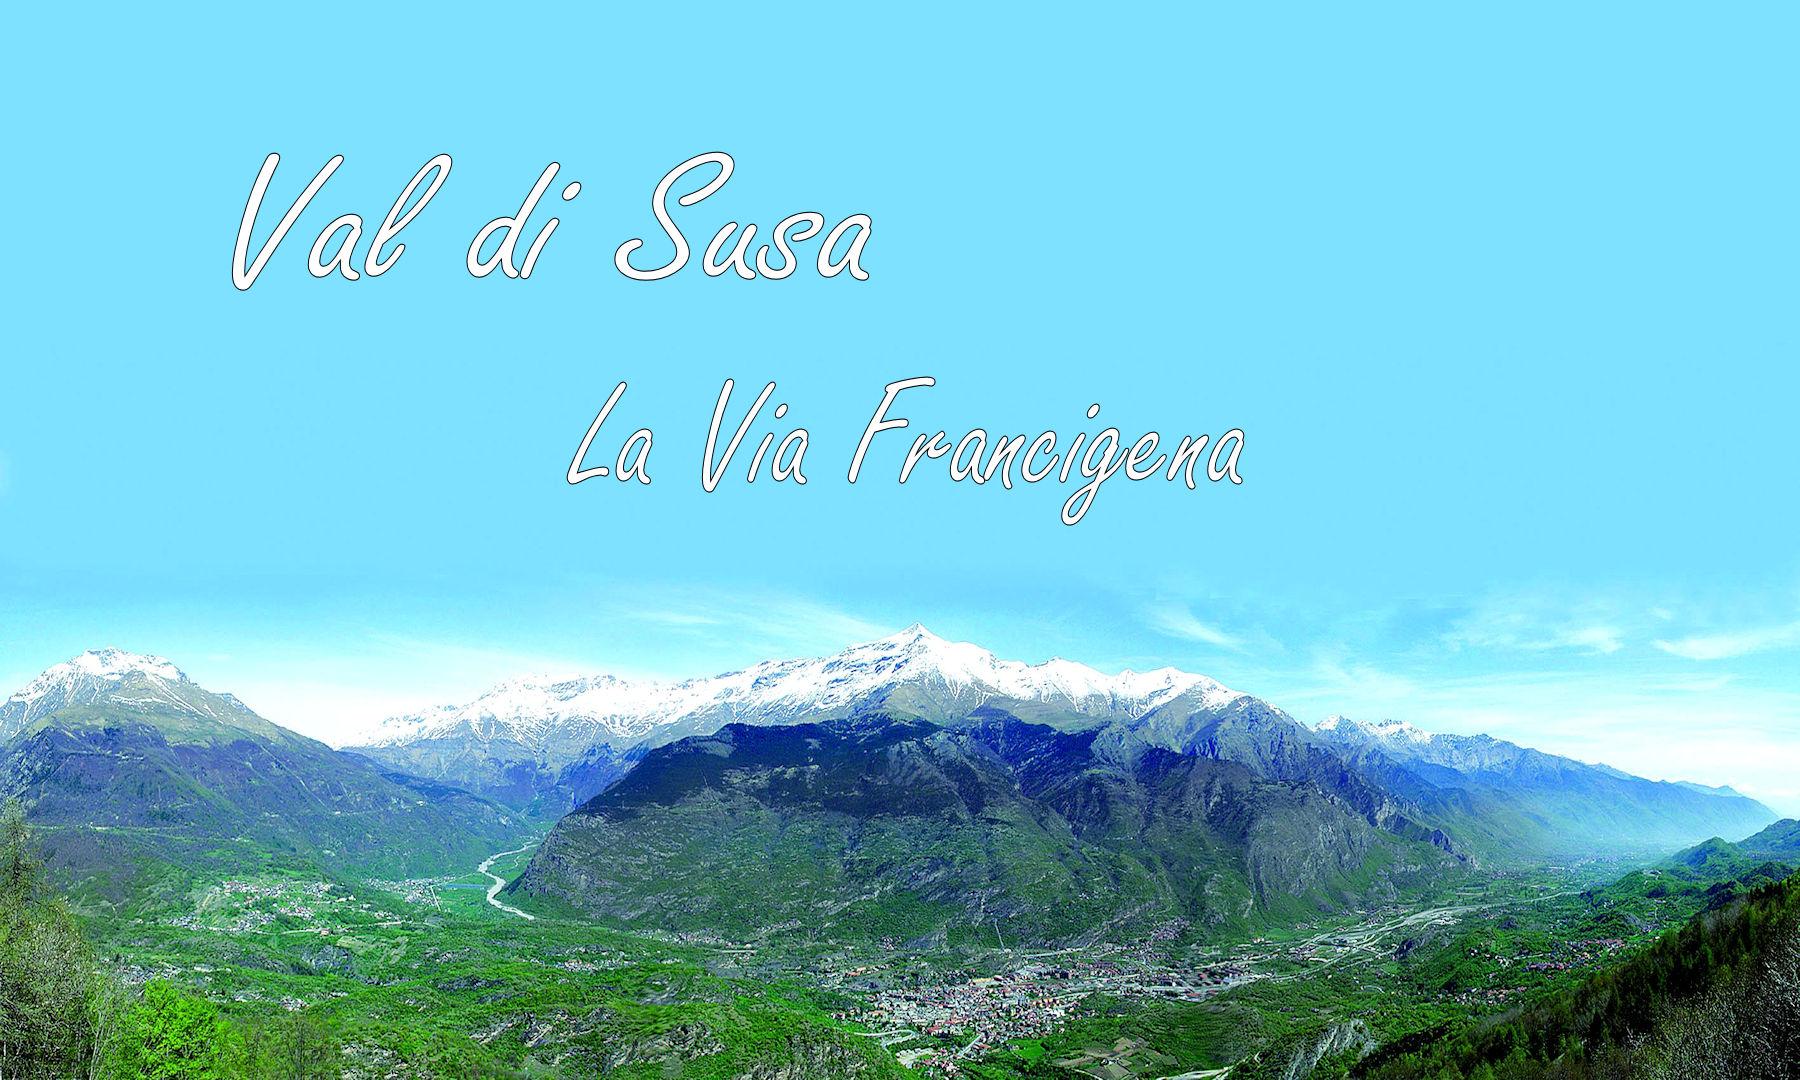 La Via Francigena in Val di Susa